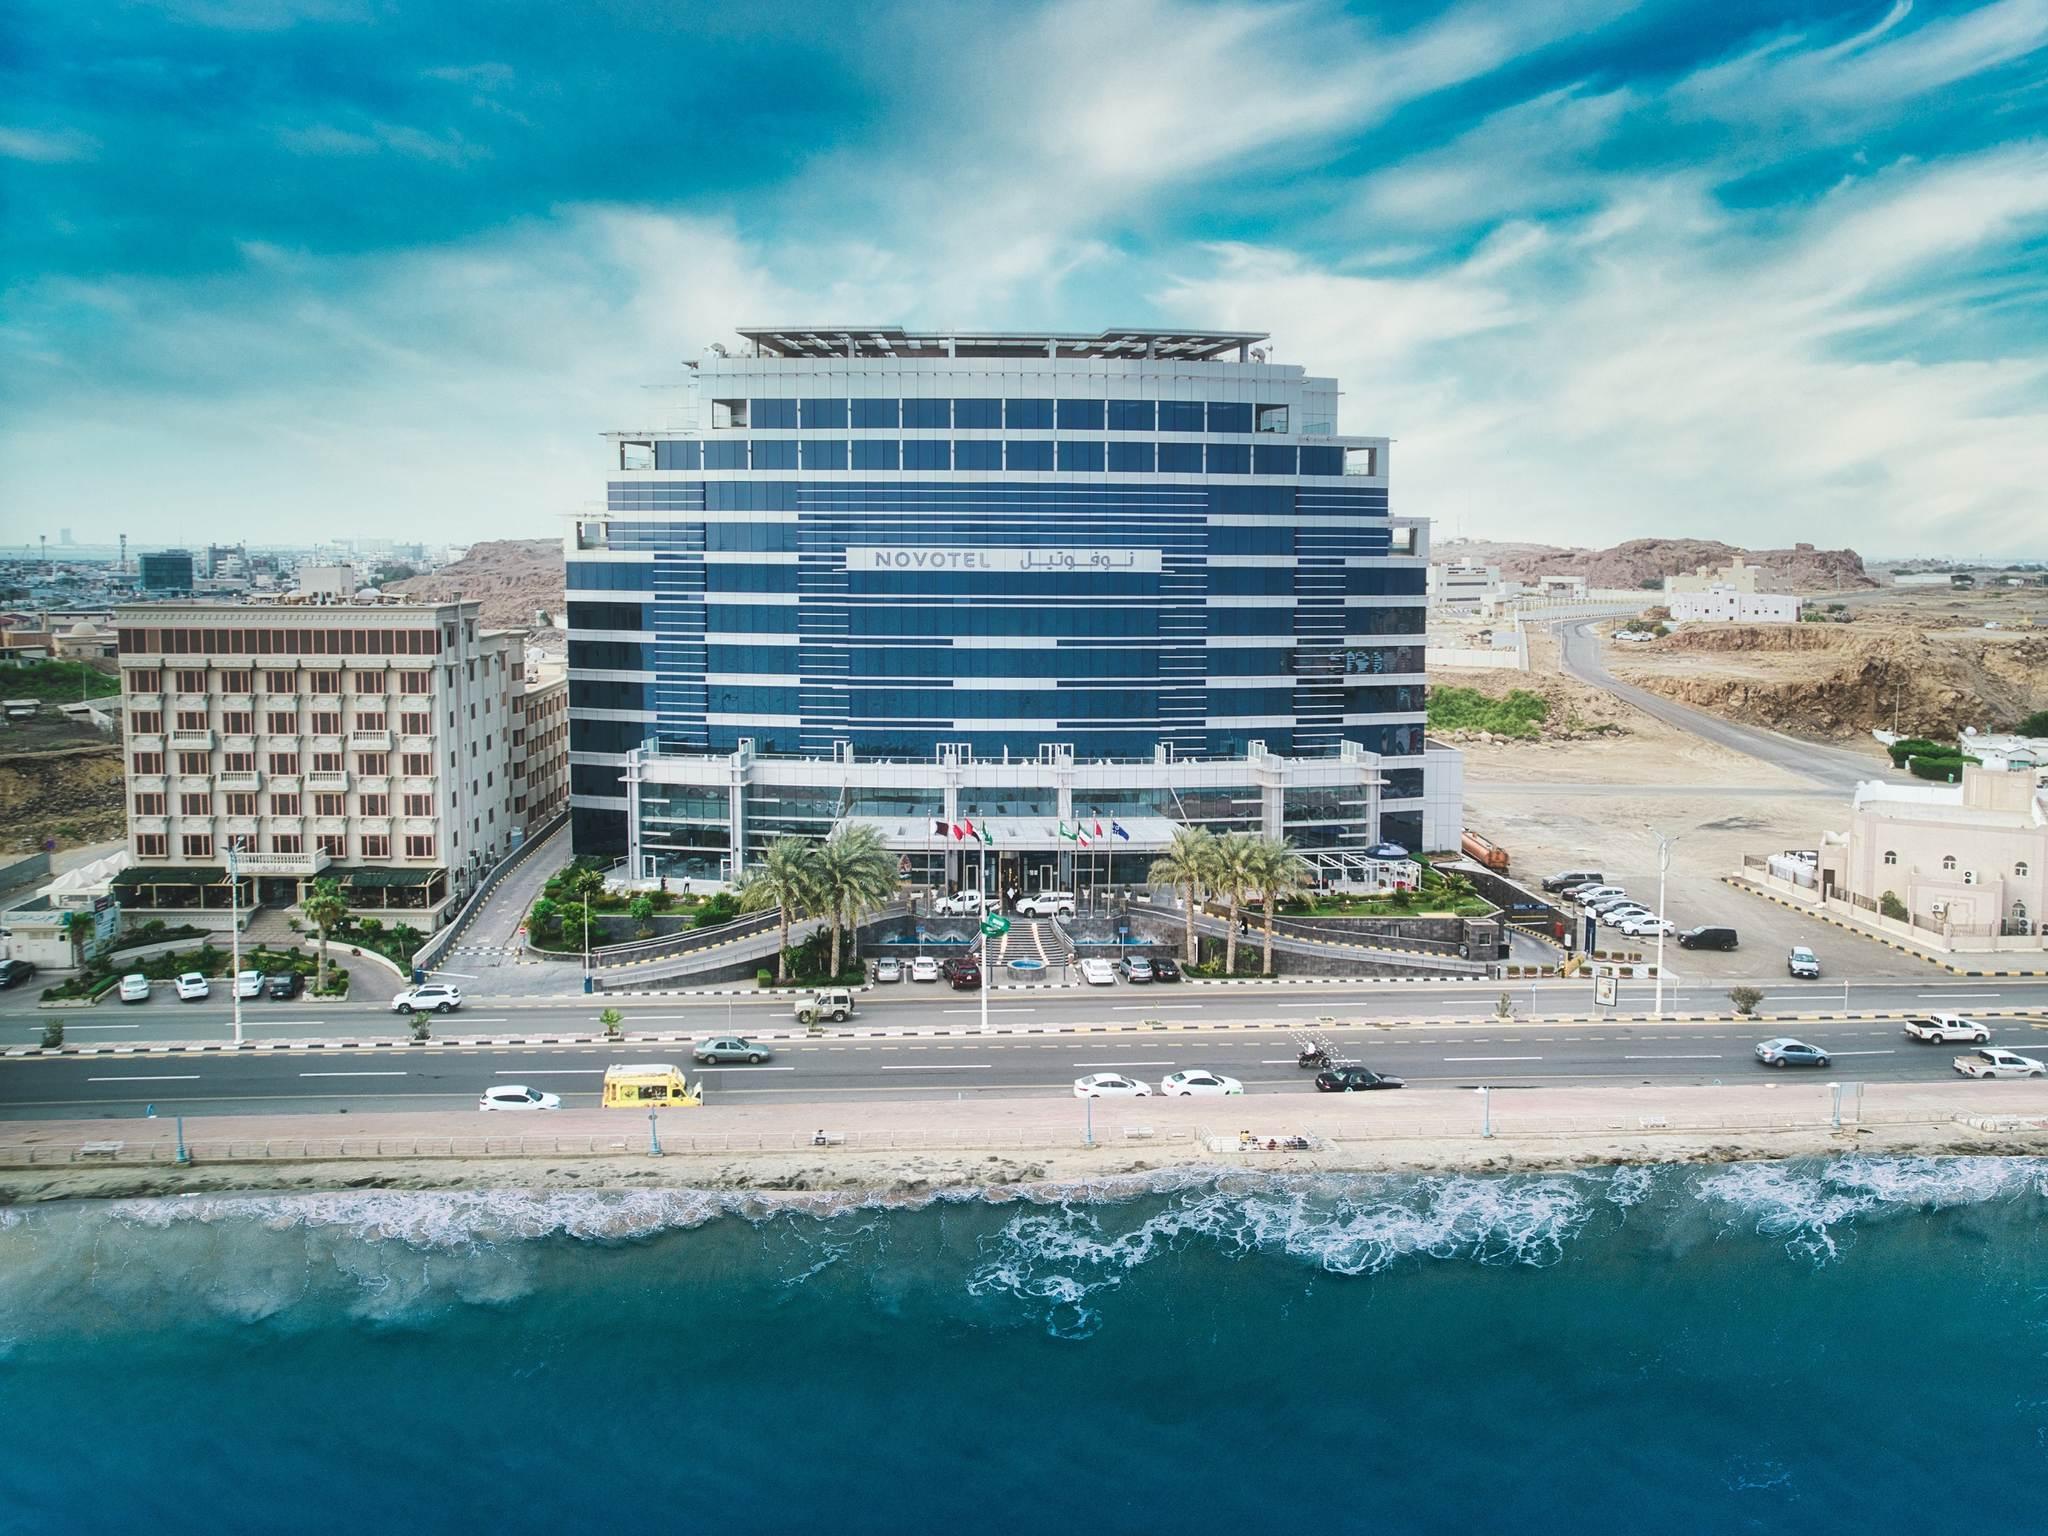 فندق - فندق نوفوتيل Novotel جازان